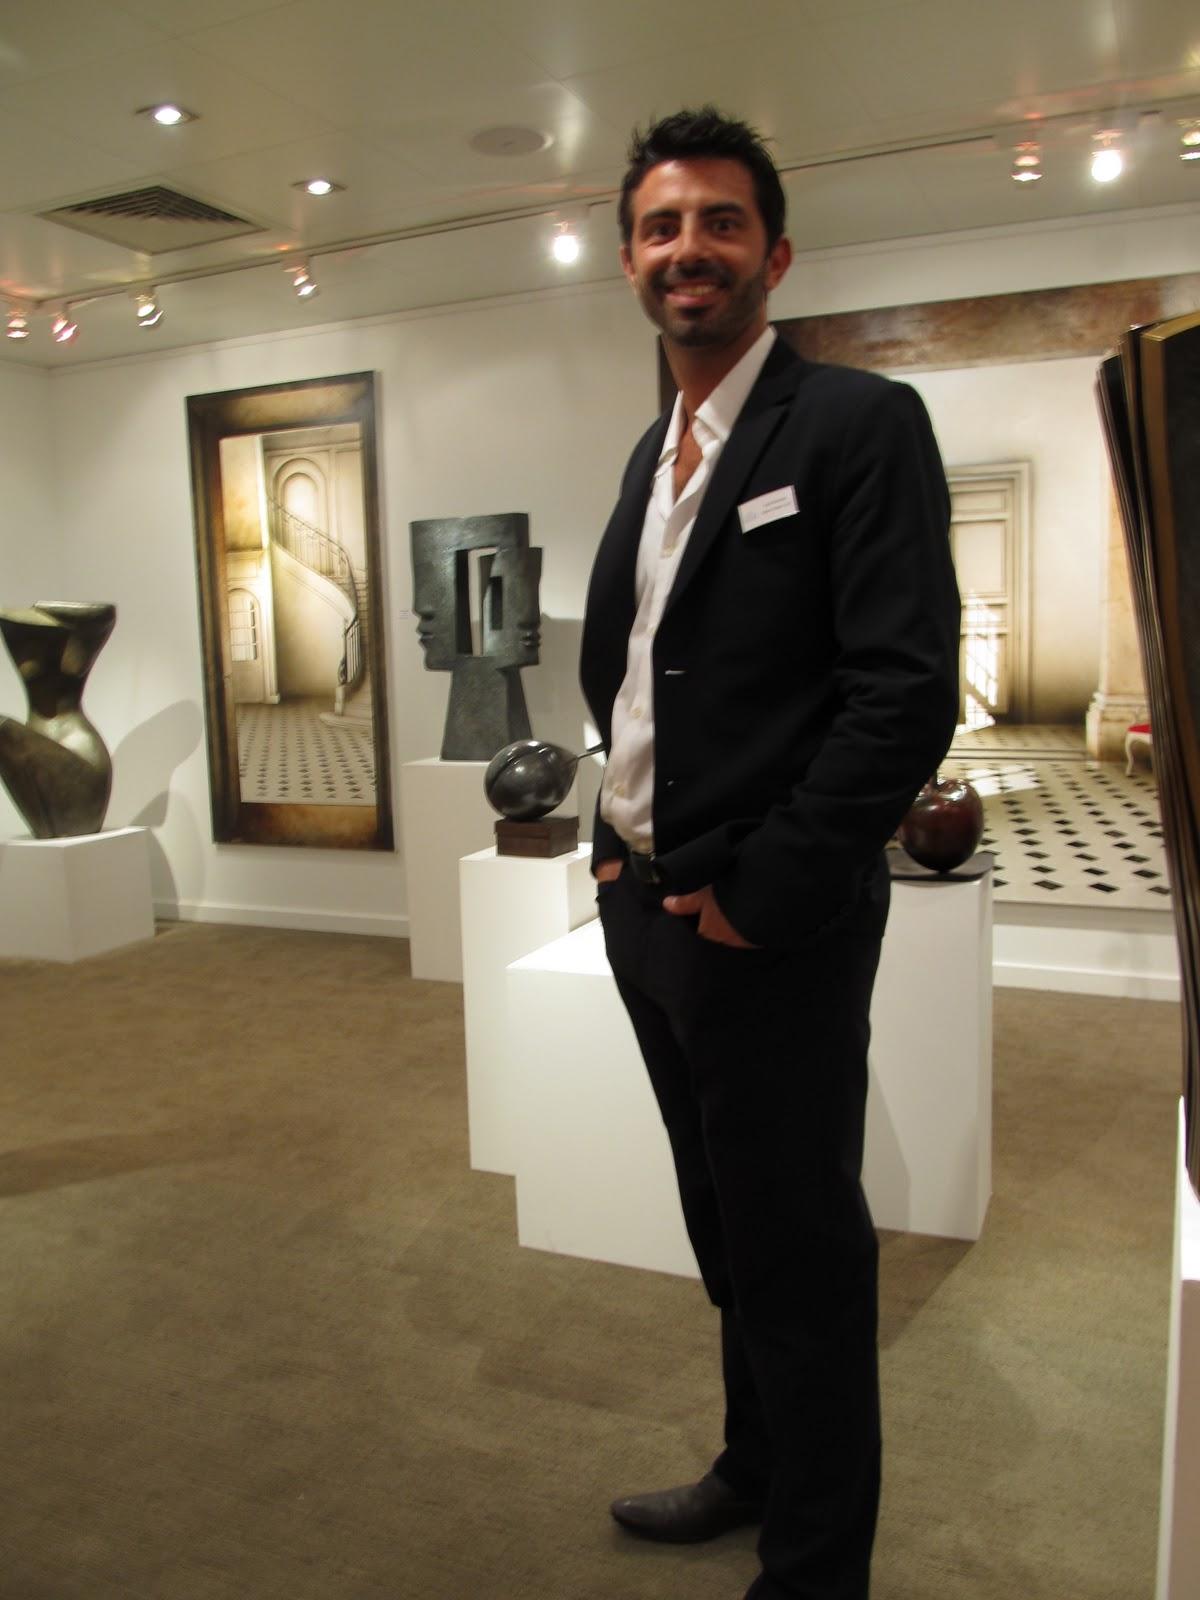 Sarasota Yacht Club >> A Successful Art Sarasota 2011, The Megayacht Venue   WUM